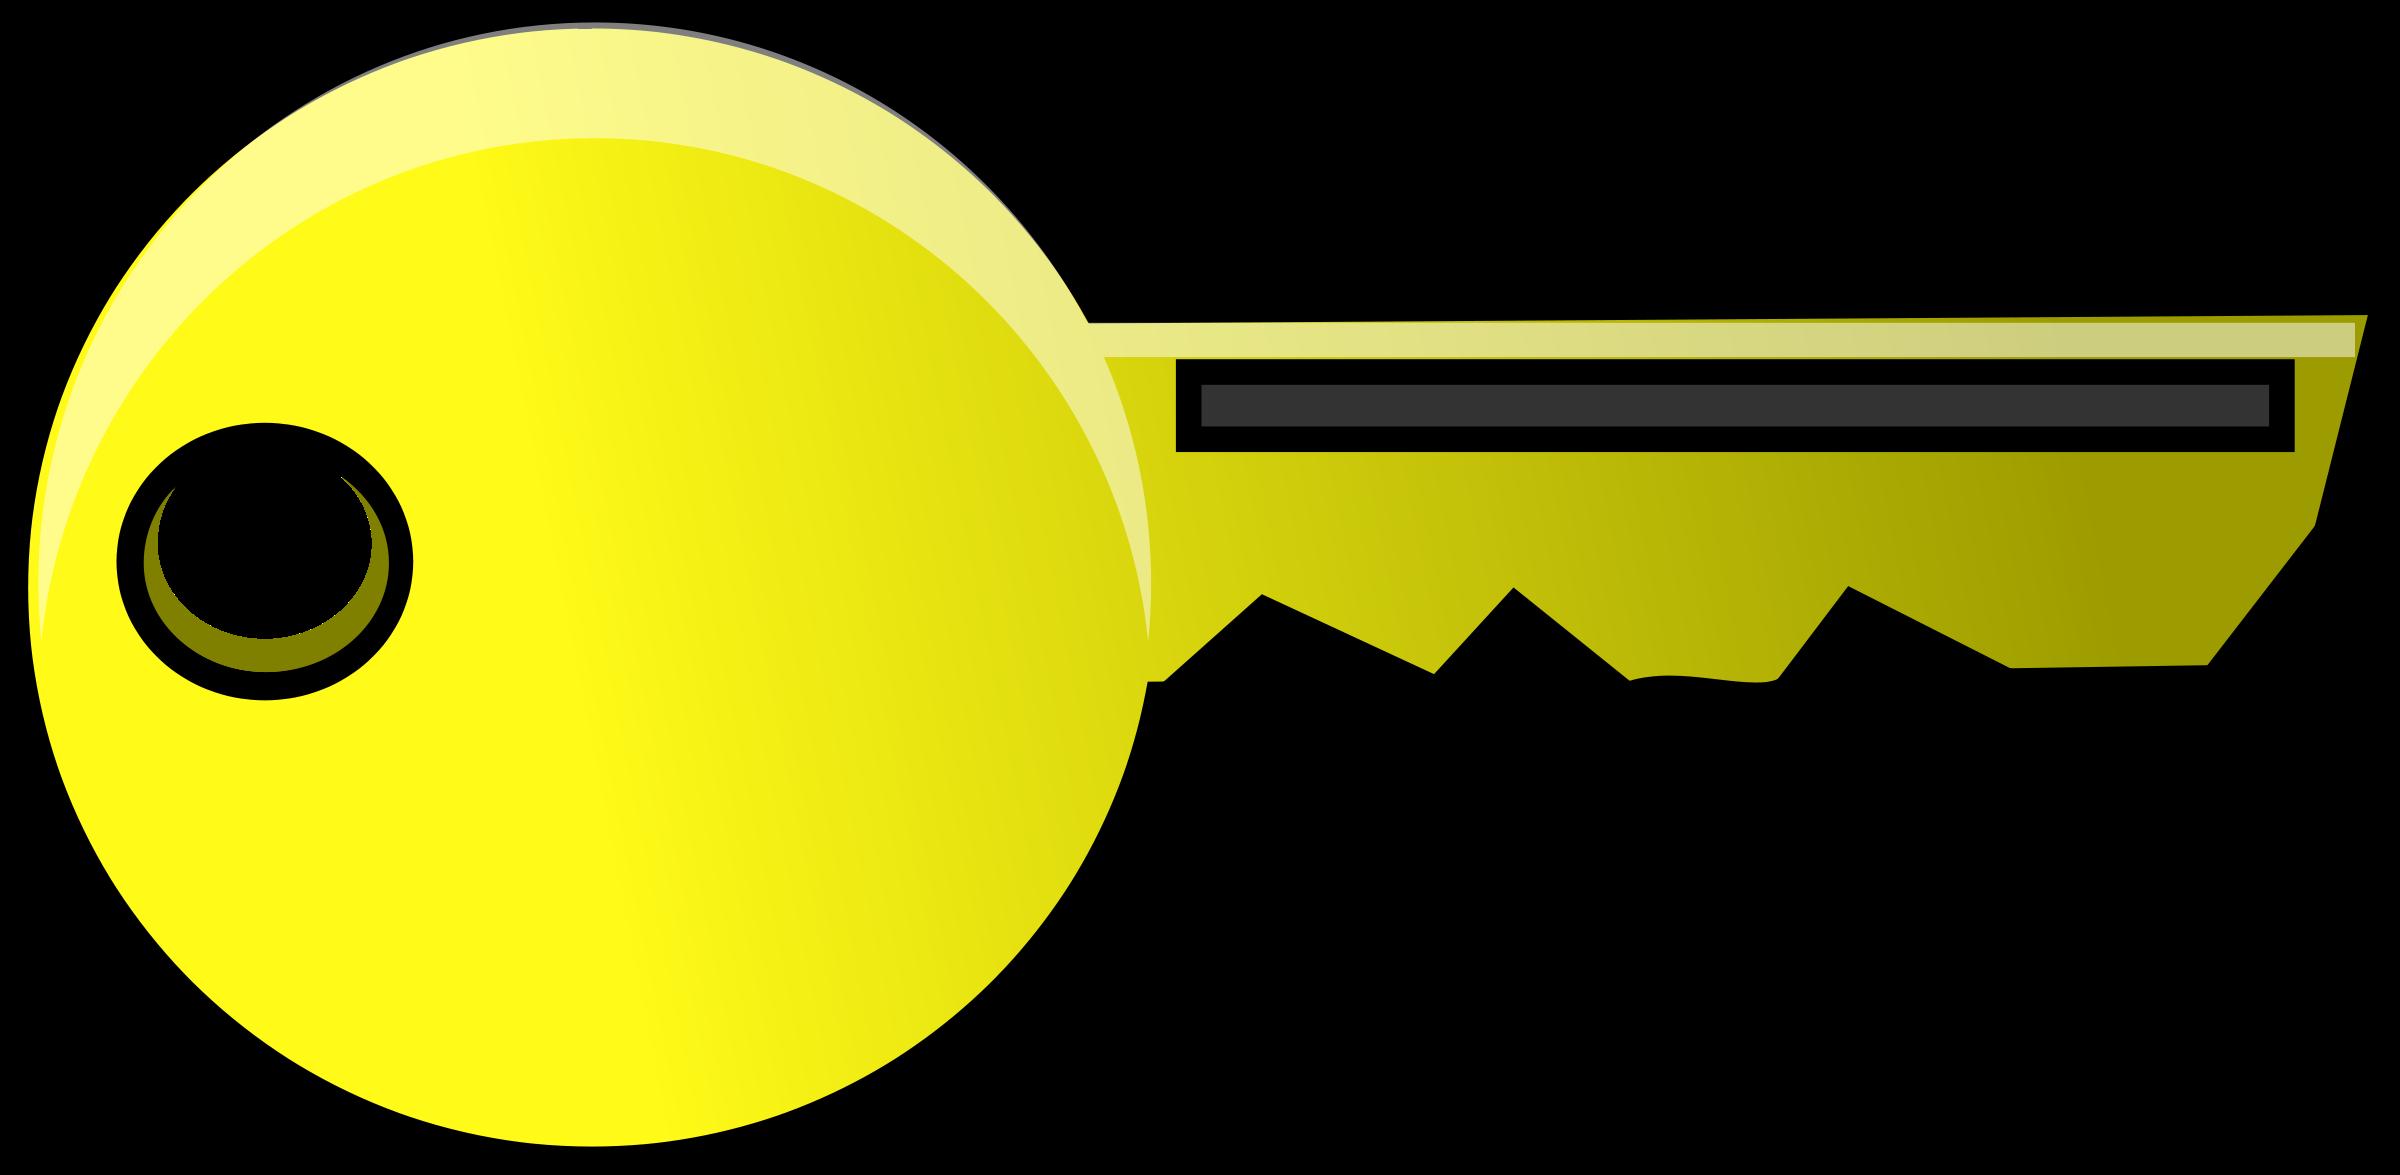 2400x1175 Golden Key Outline Clip Art